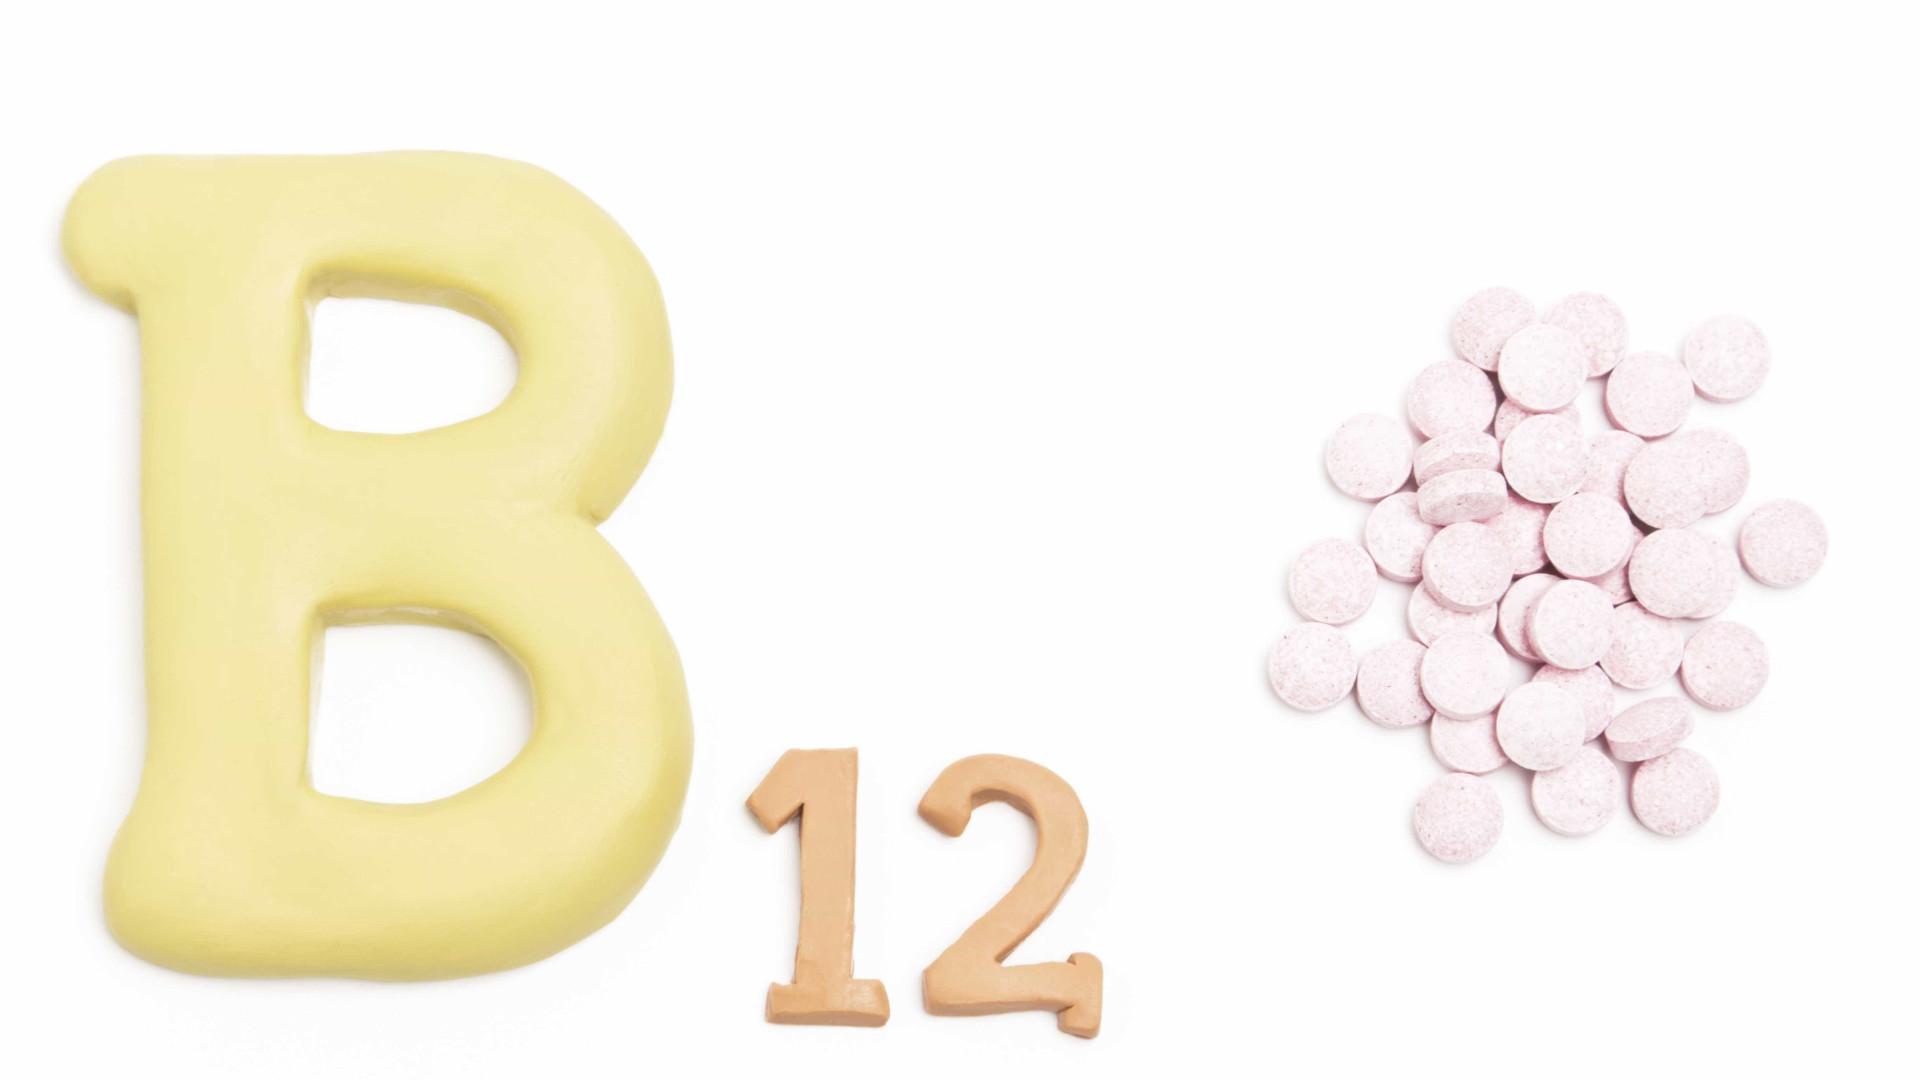 Será carência de vitamina B12? Cinco sinais que o corpo dá